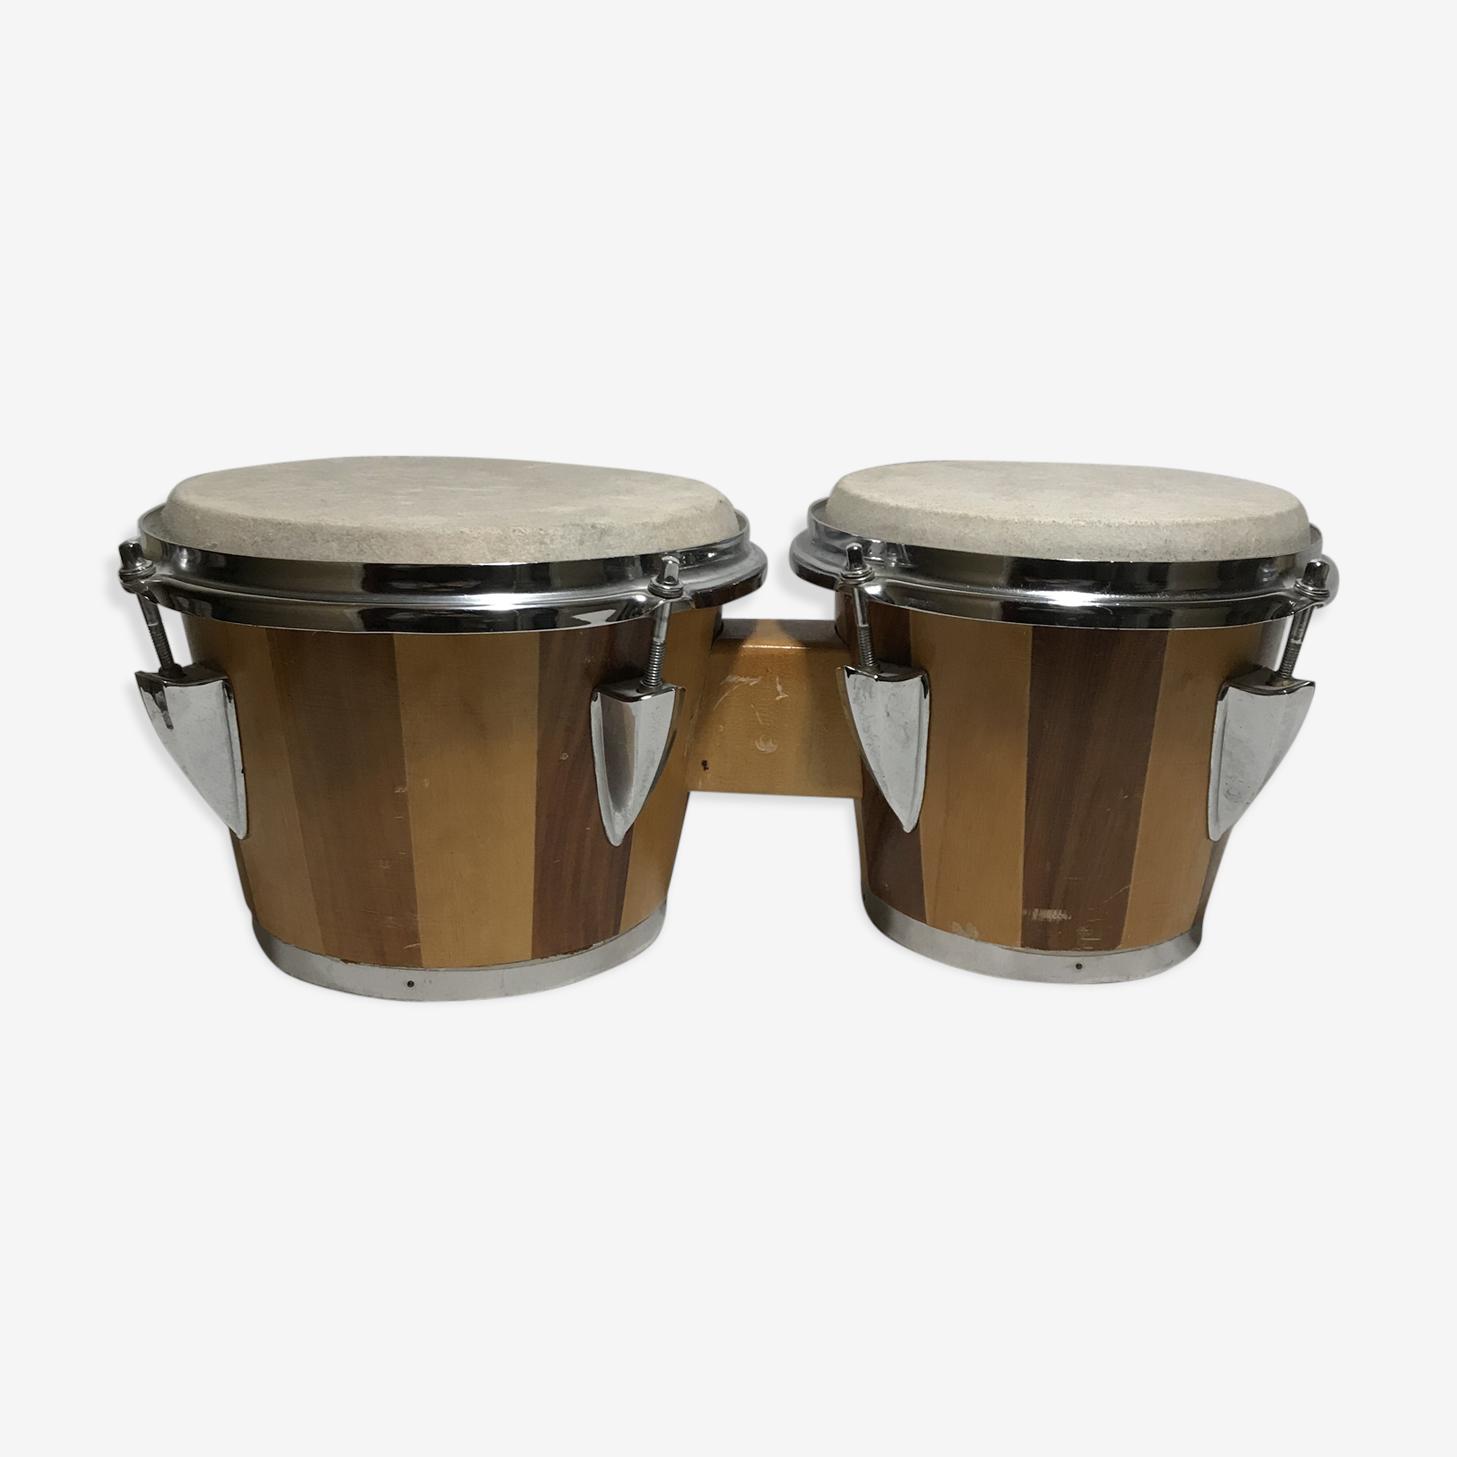 Percussions Bongo vintage